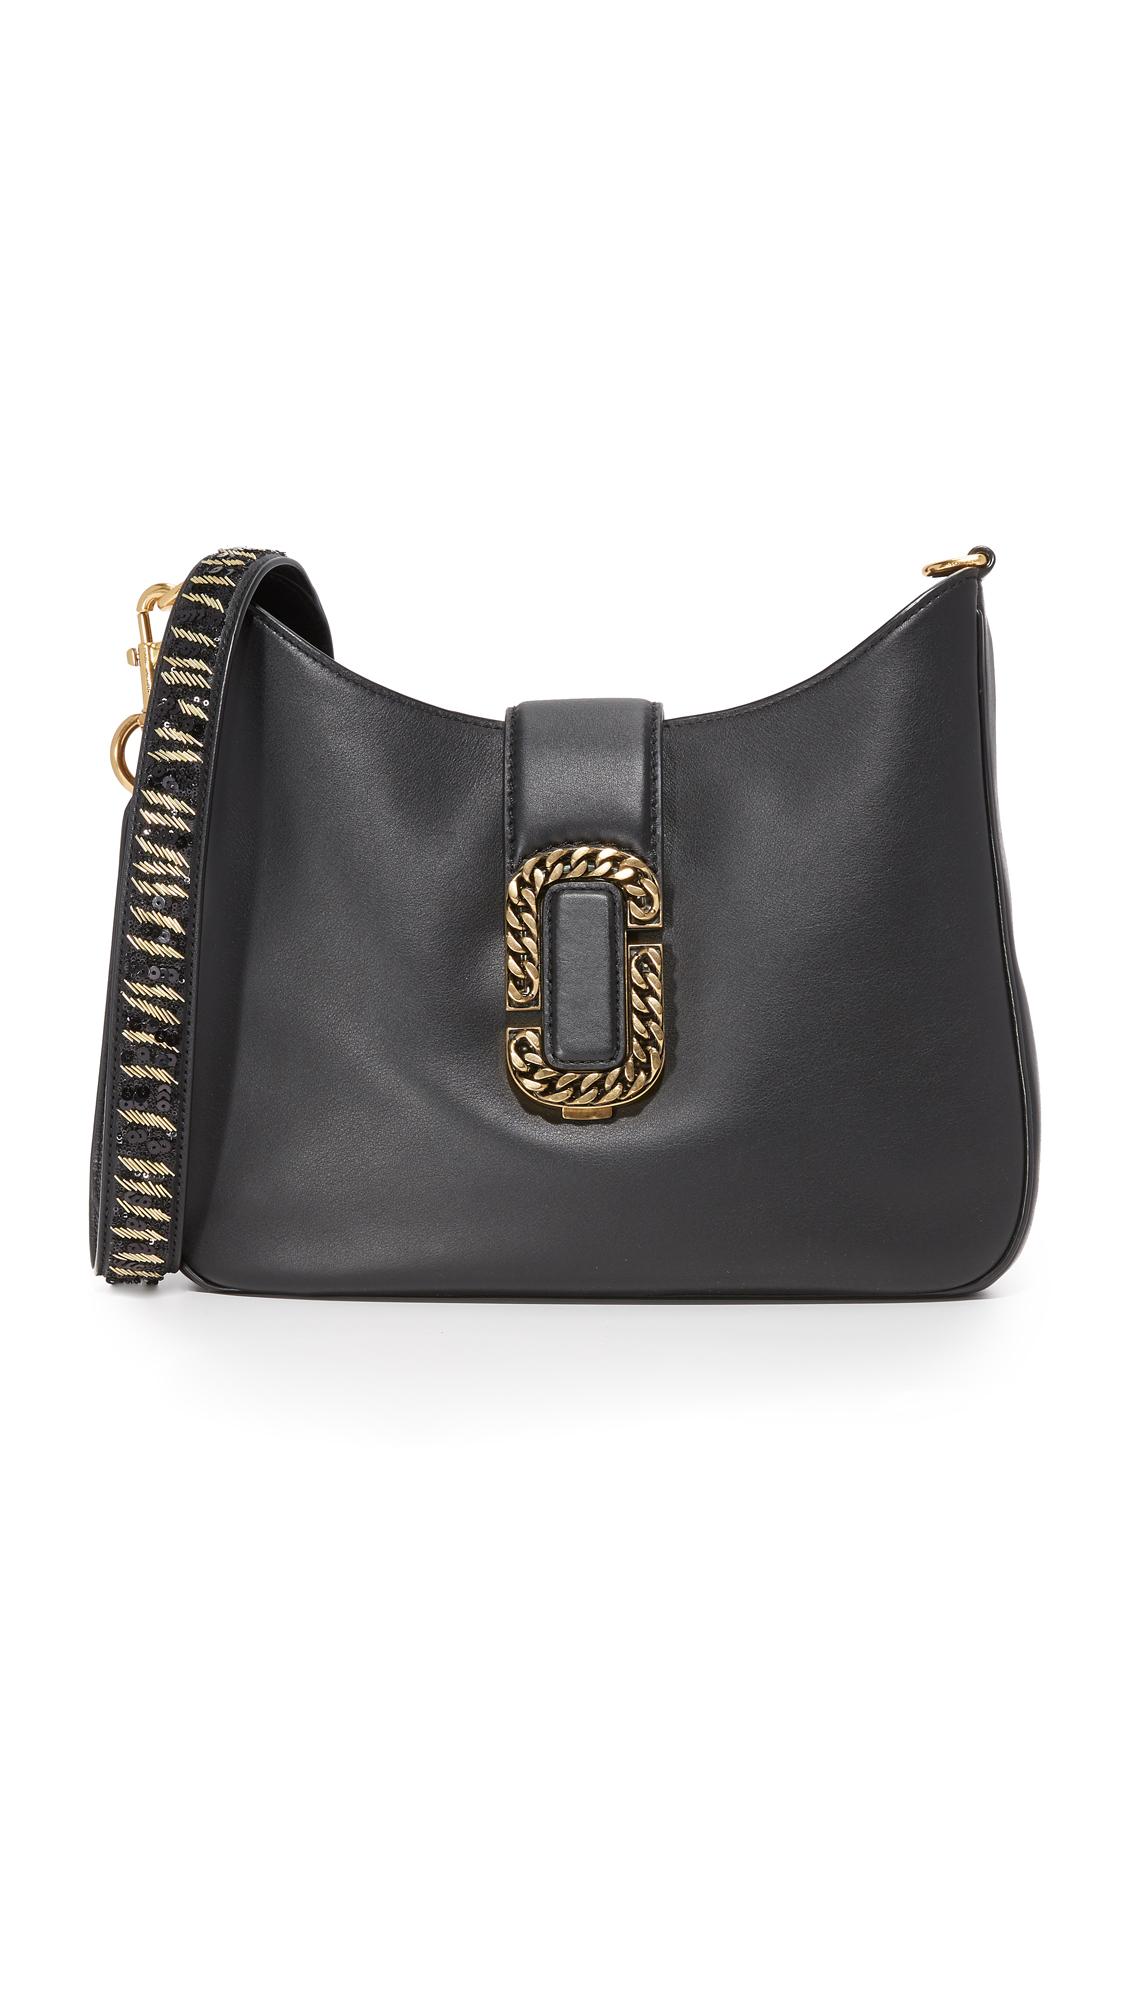 marc jacobs female marc jacobs interlock chain hobo bag black multi